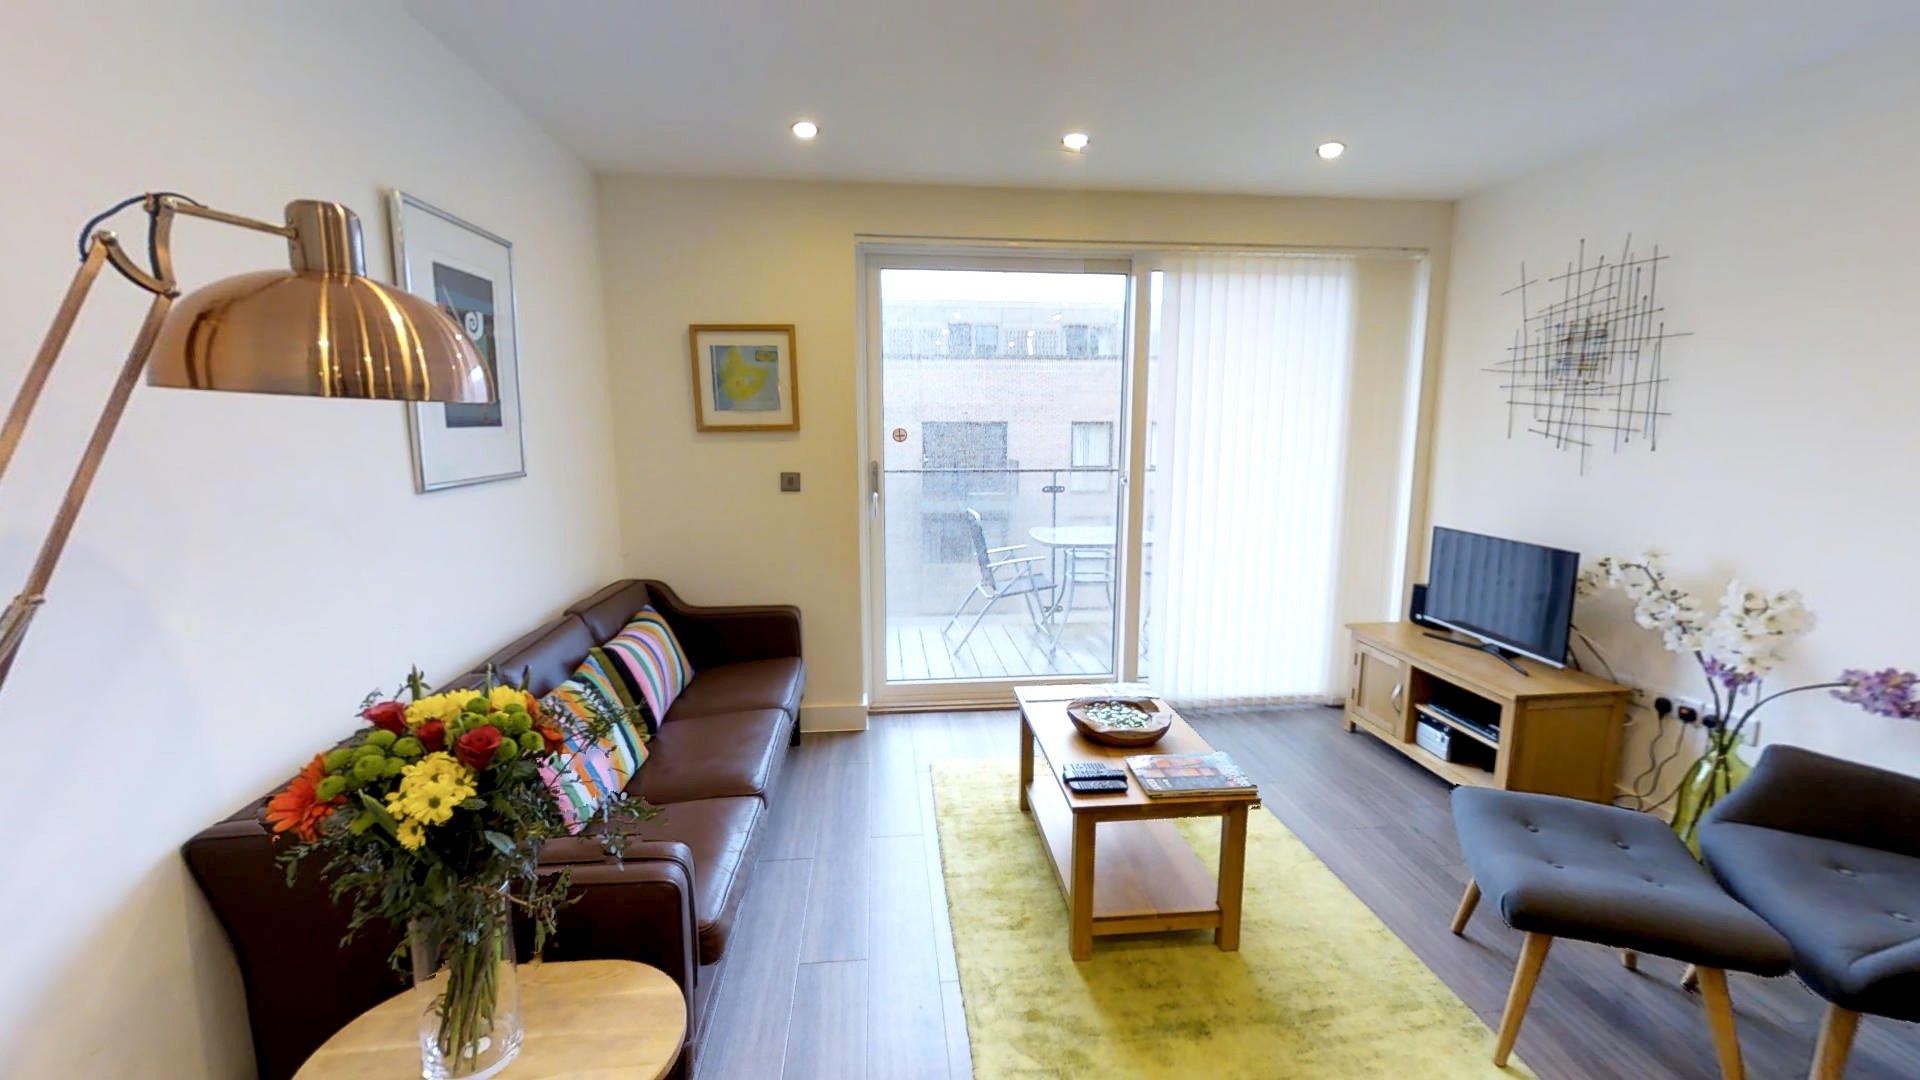 Spacious apartments in a central Cambridge location.